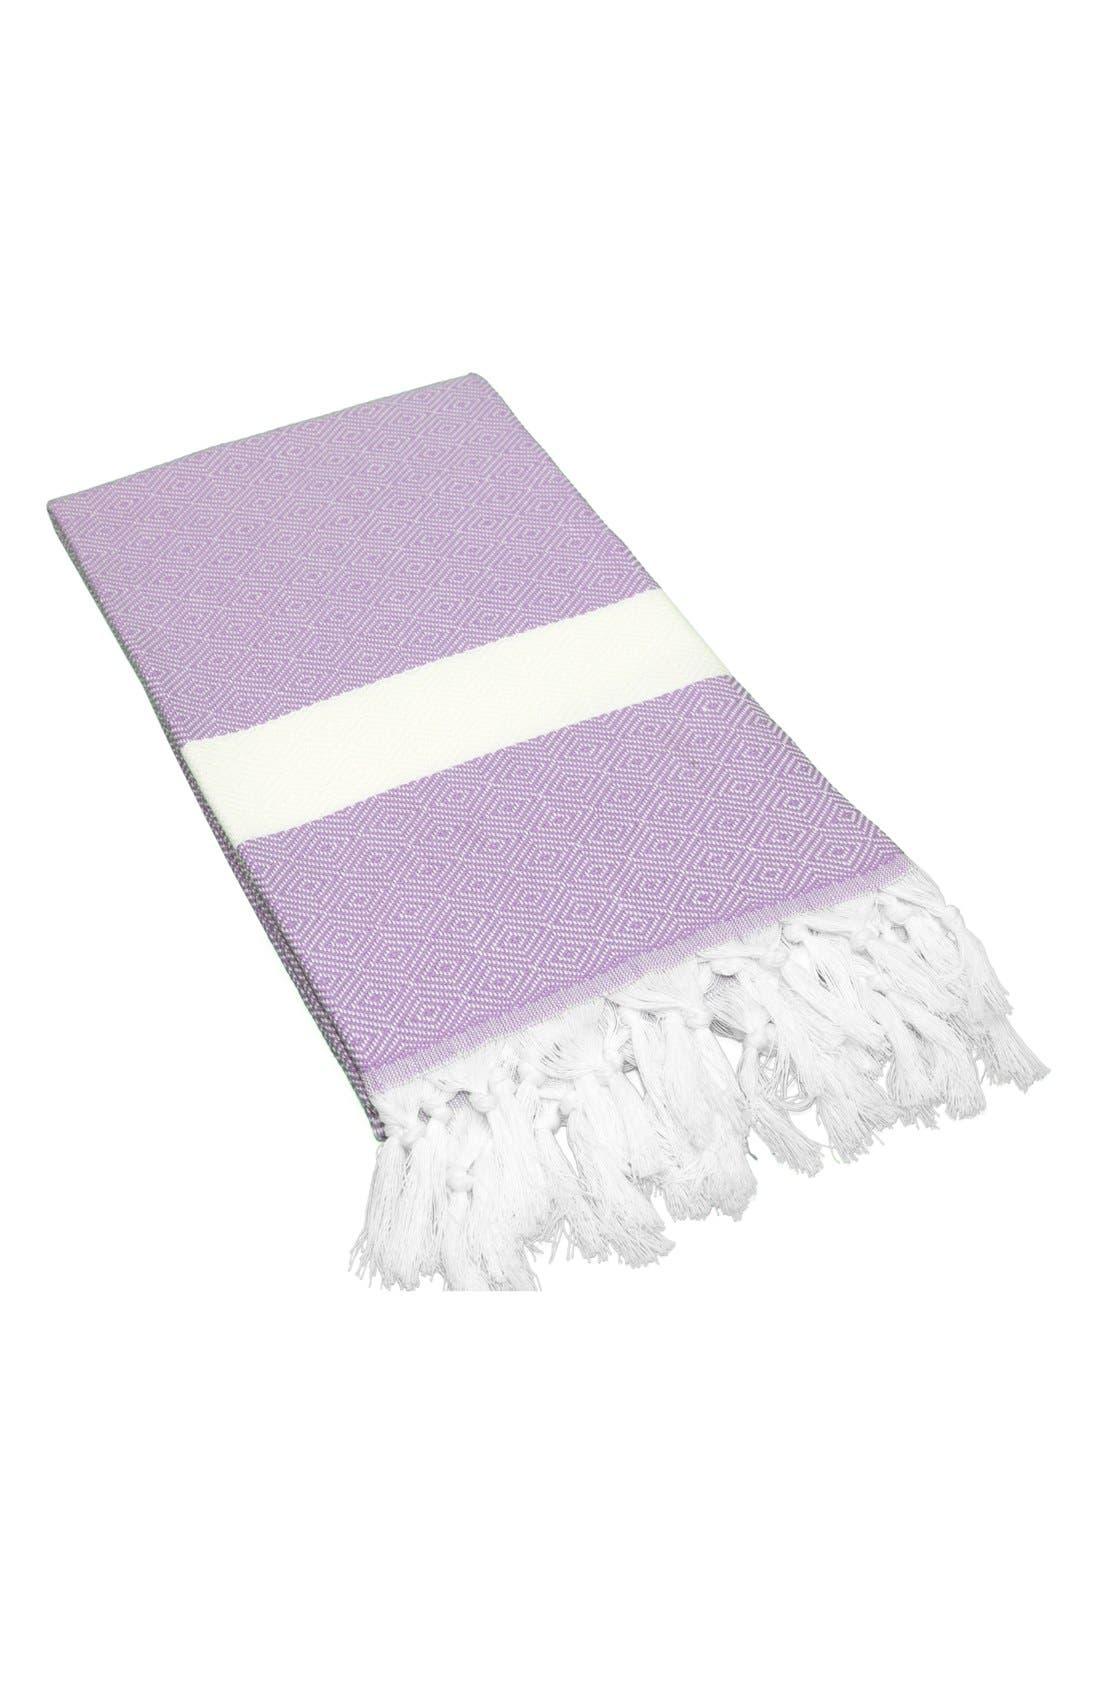 Linum Home Textiles 'Diamond' Turkish Pestemal Towel